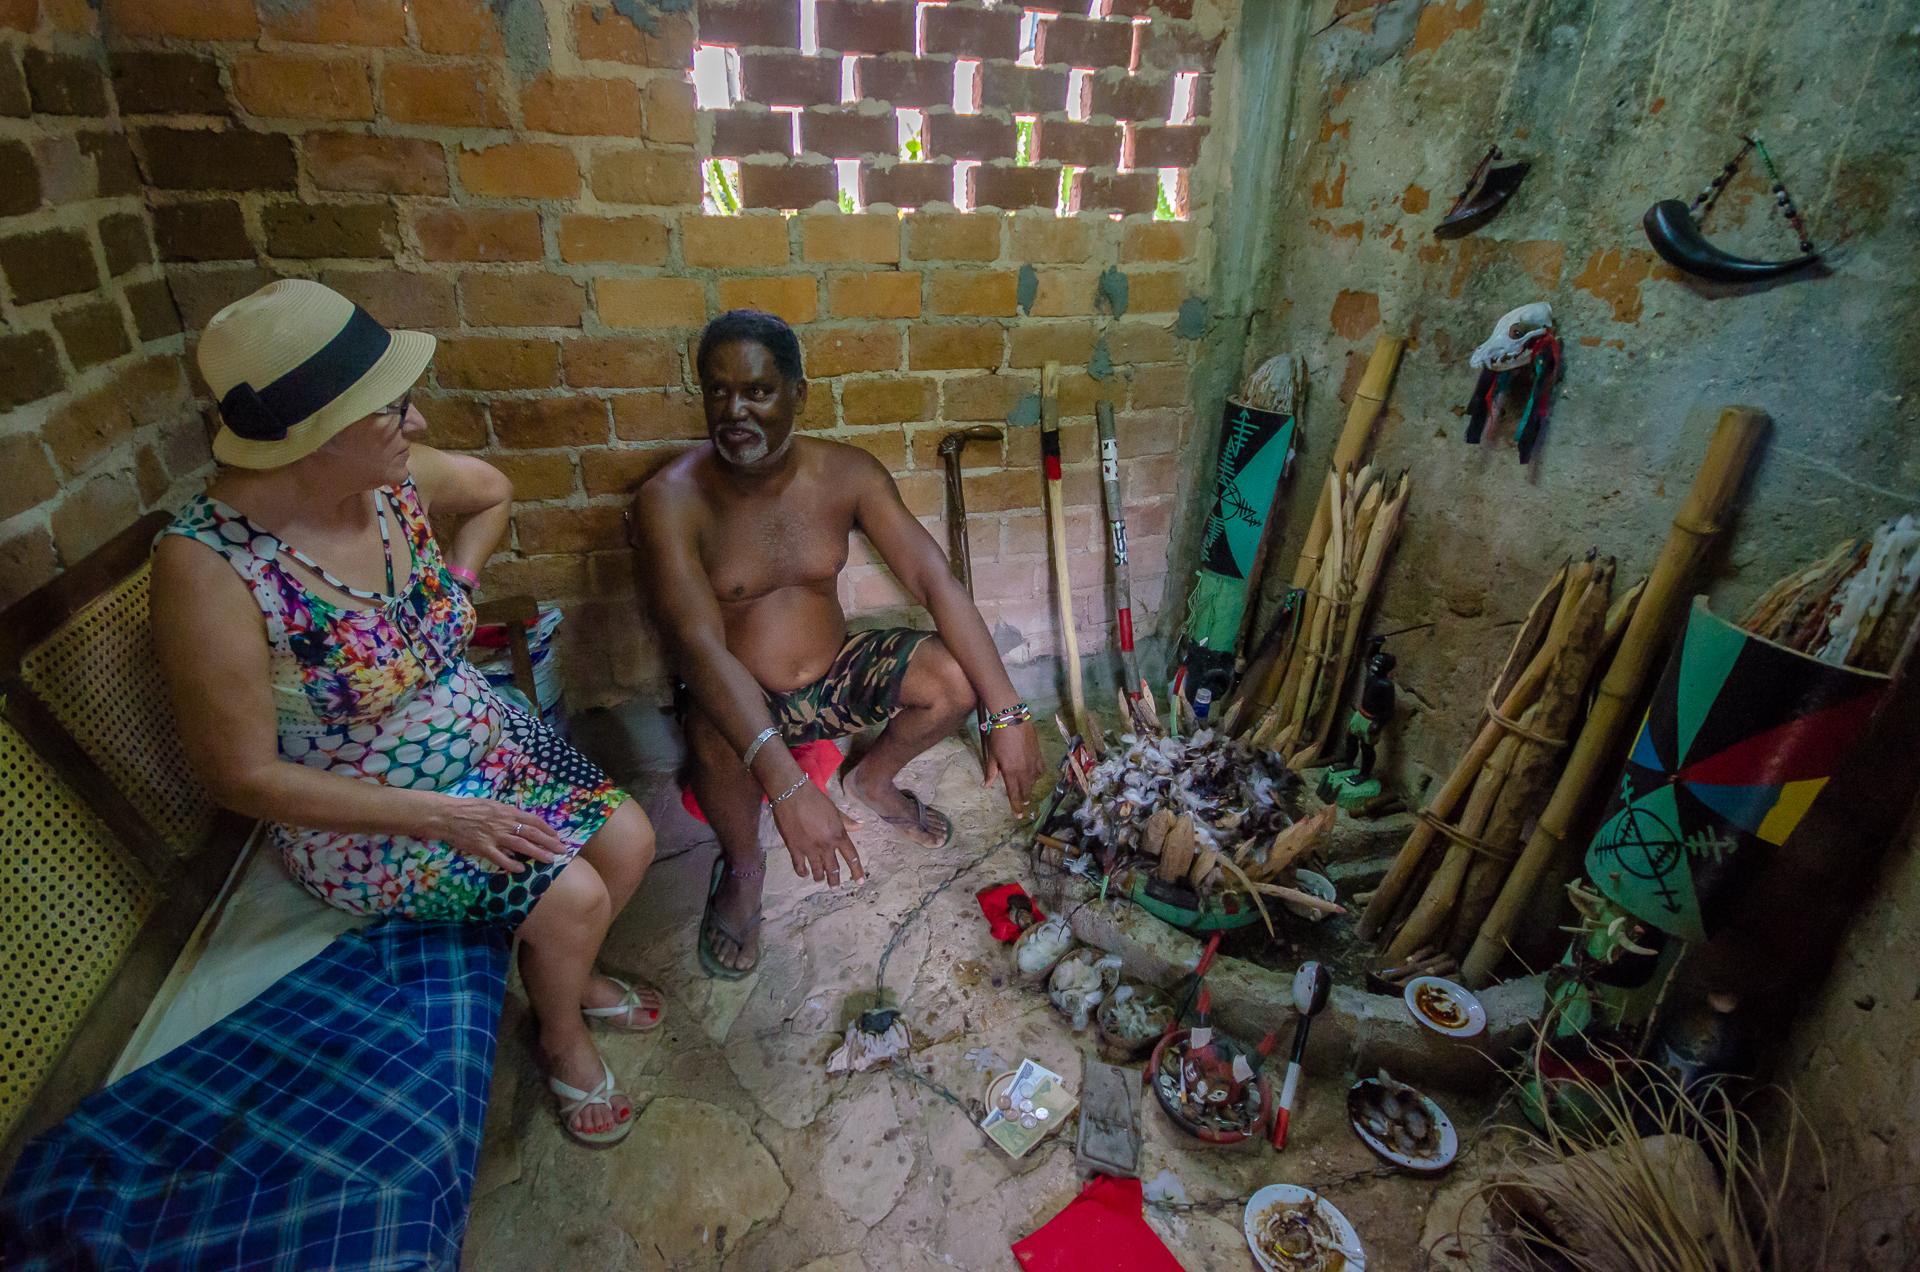 Visite chez un Santero, Rafael Freyre, Holguin, Cuba